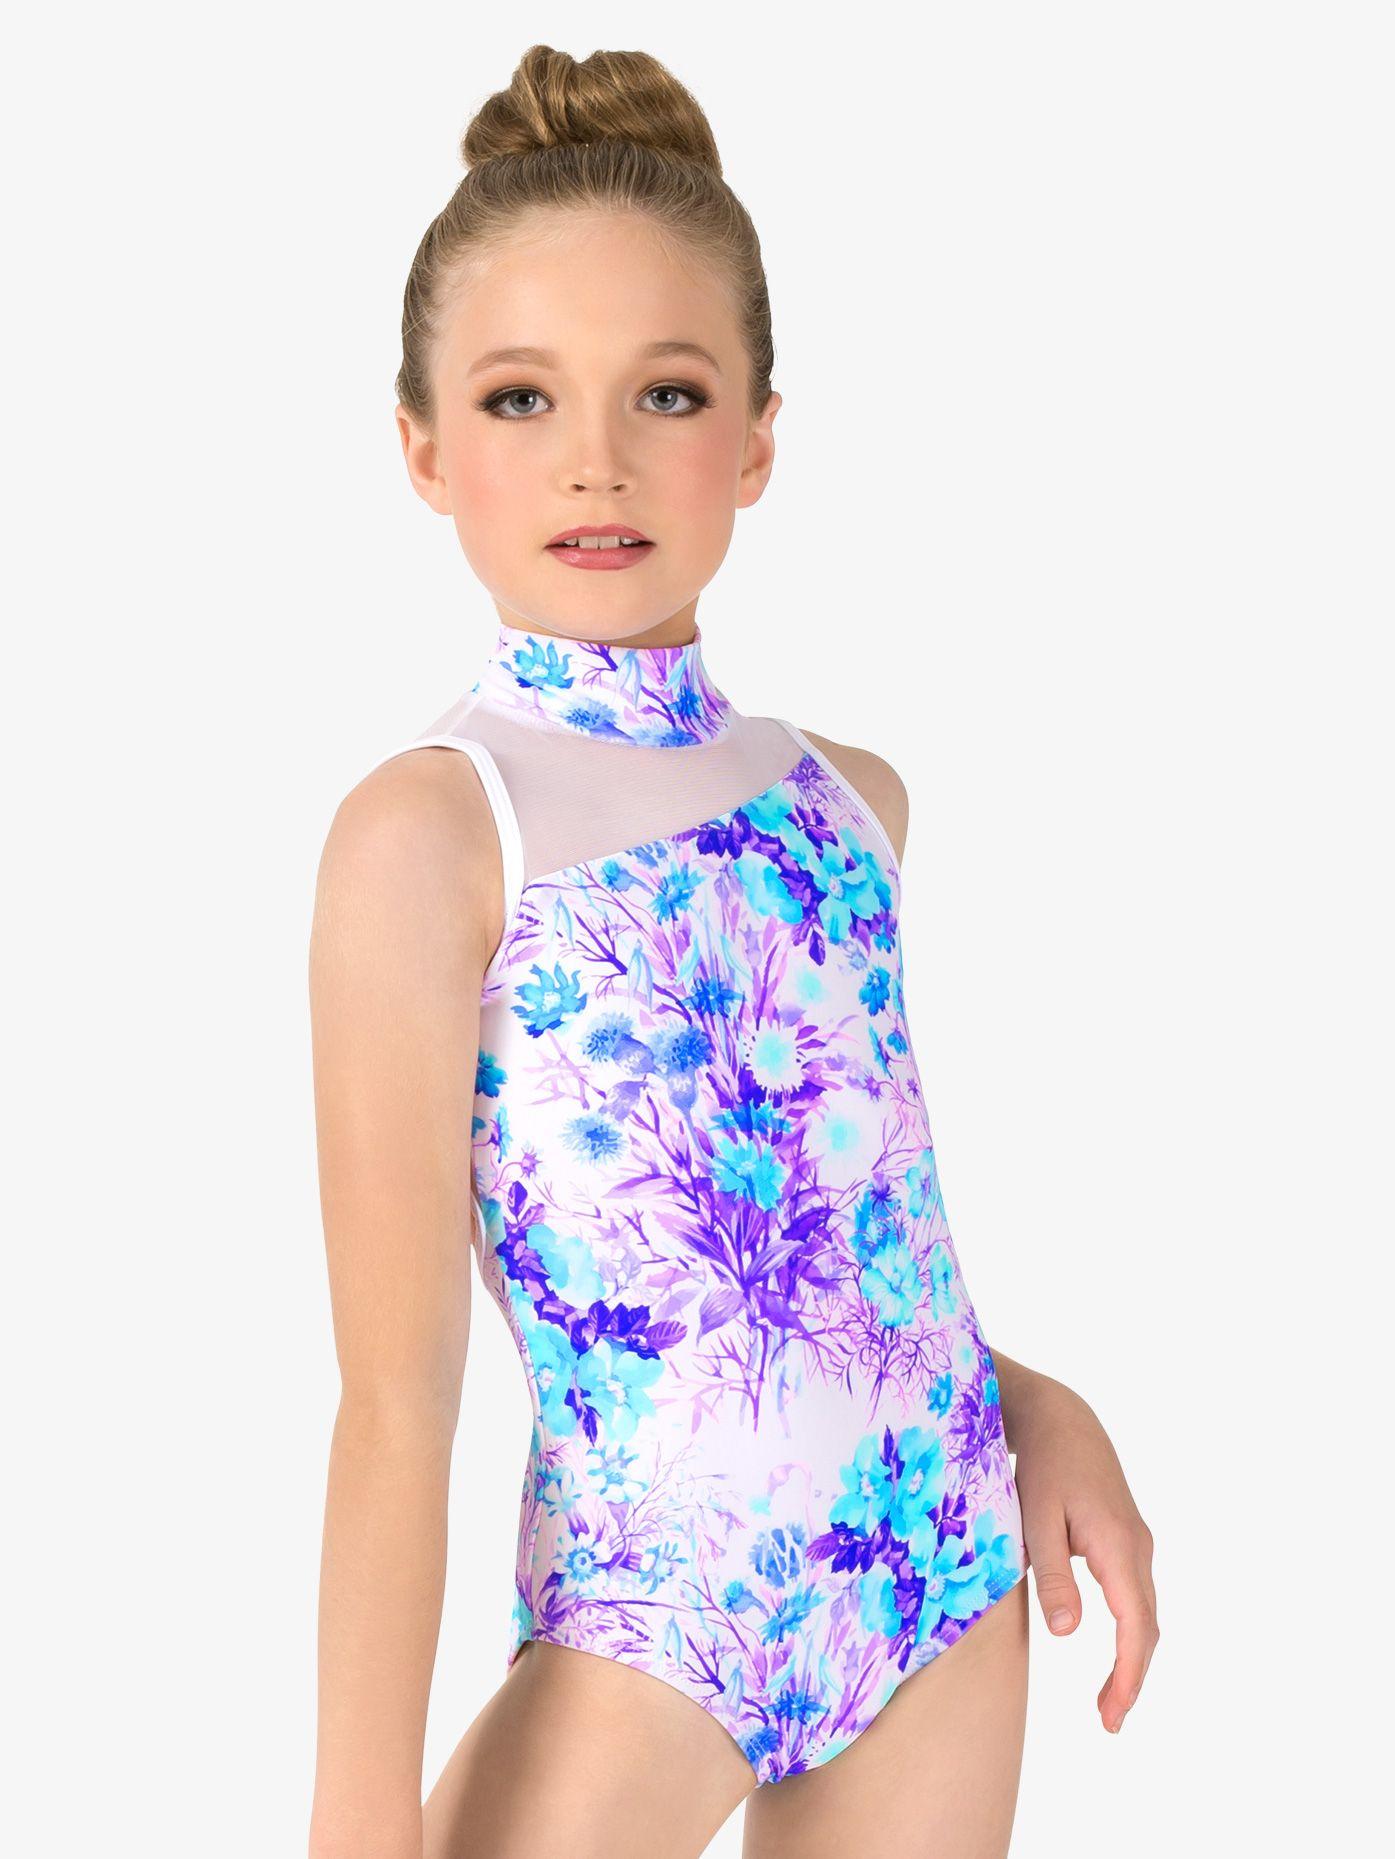 Child Girls Ballet Gymnastics Dance Leotard Full Body Unitards Dancewear Costume